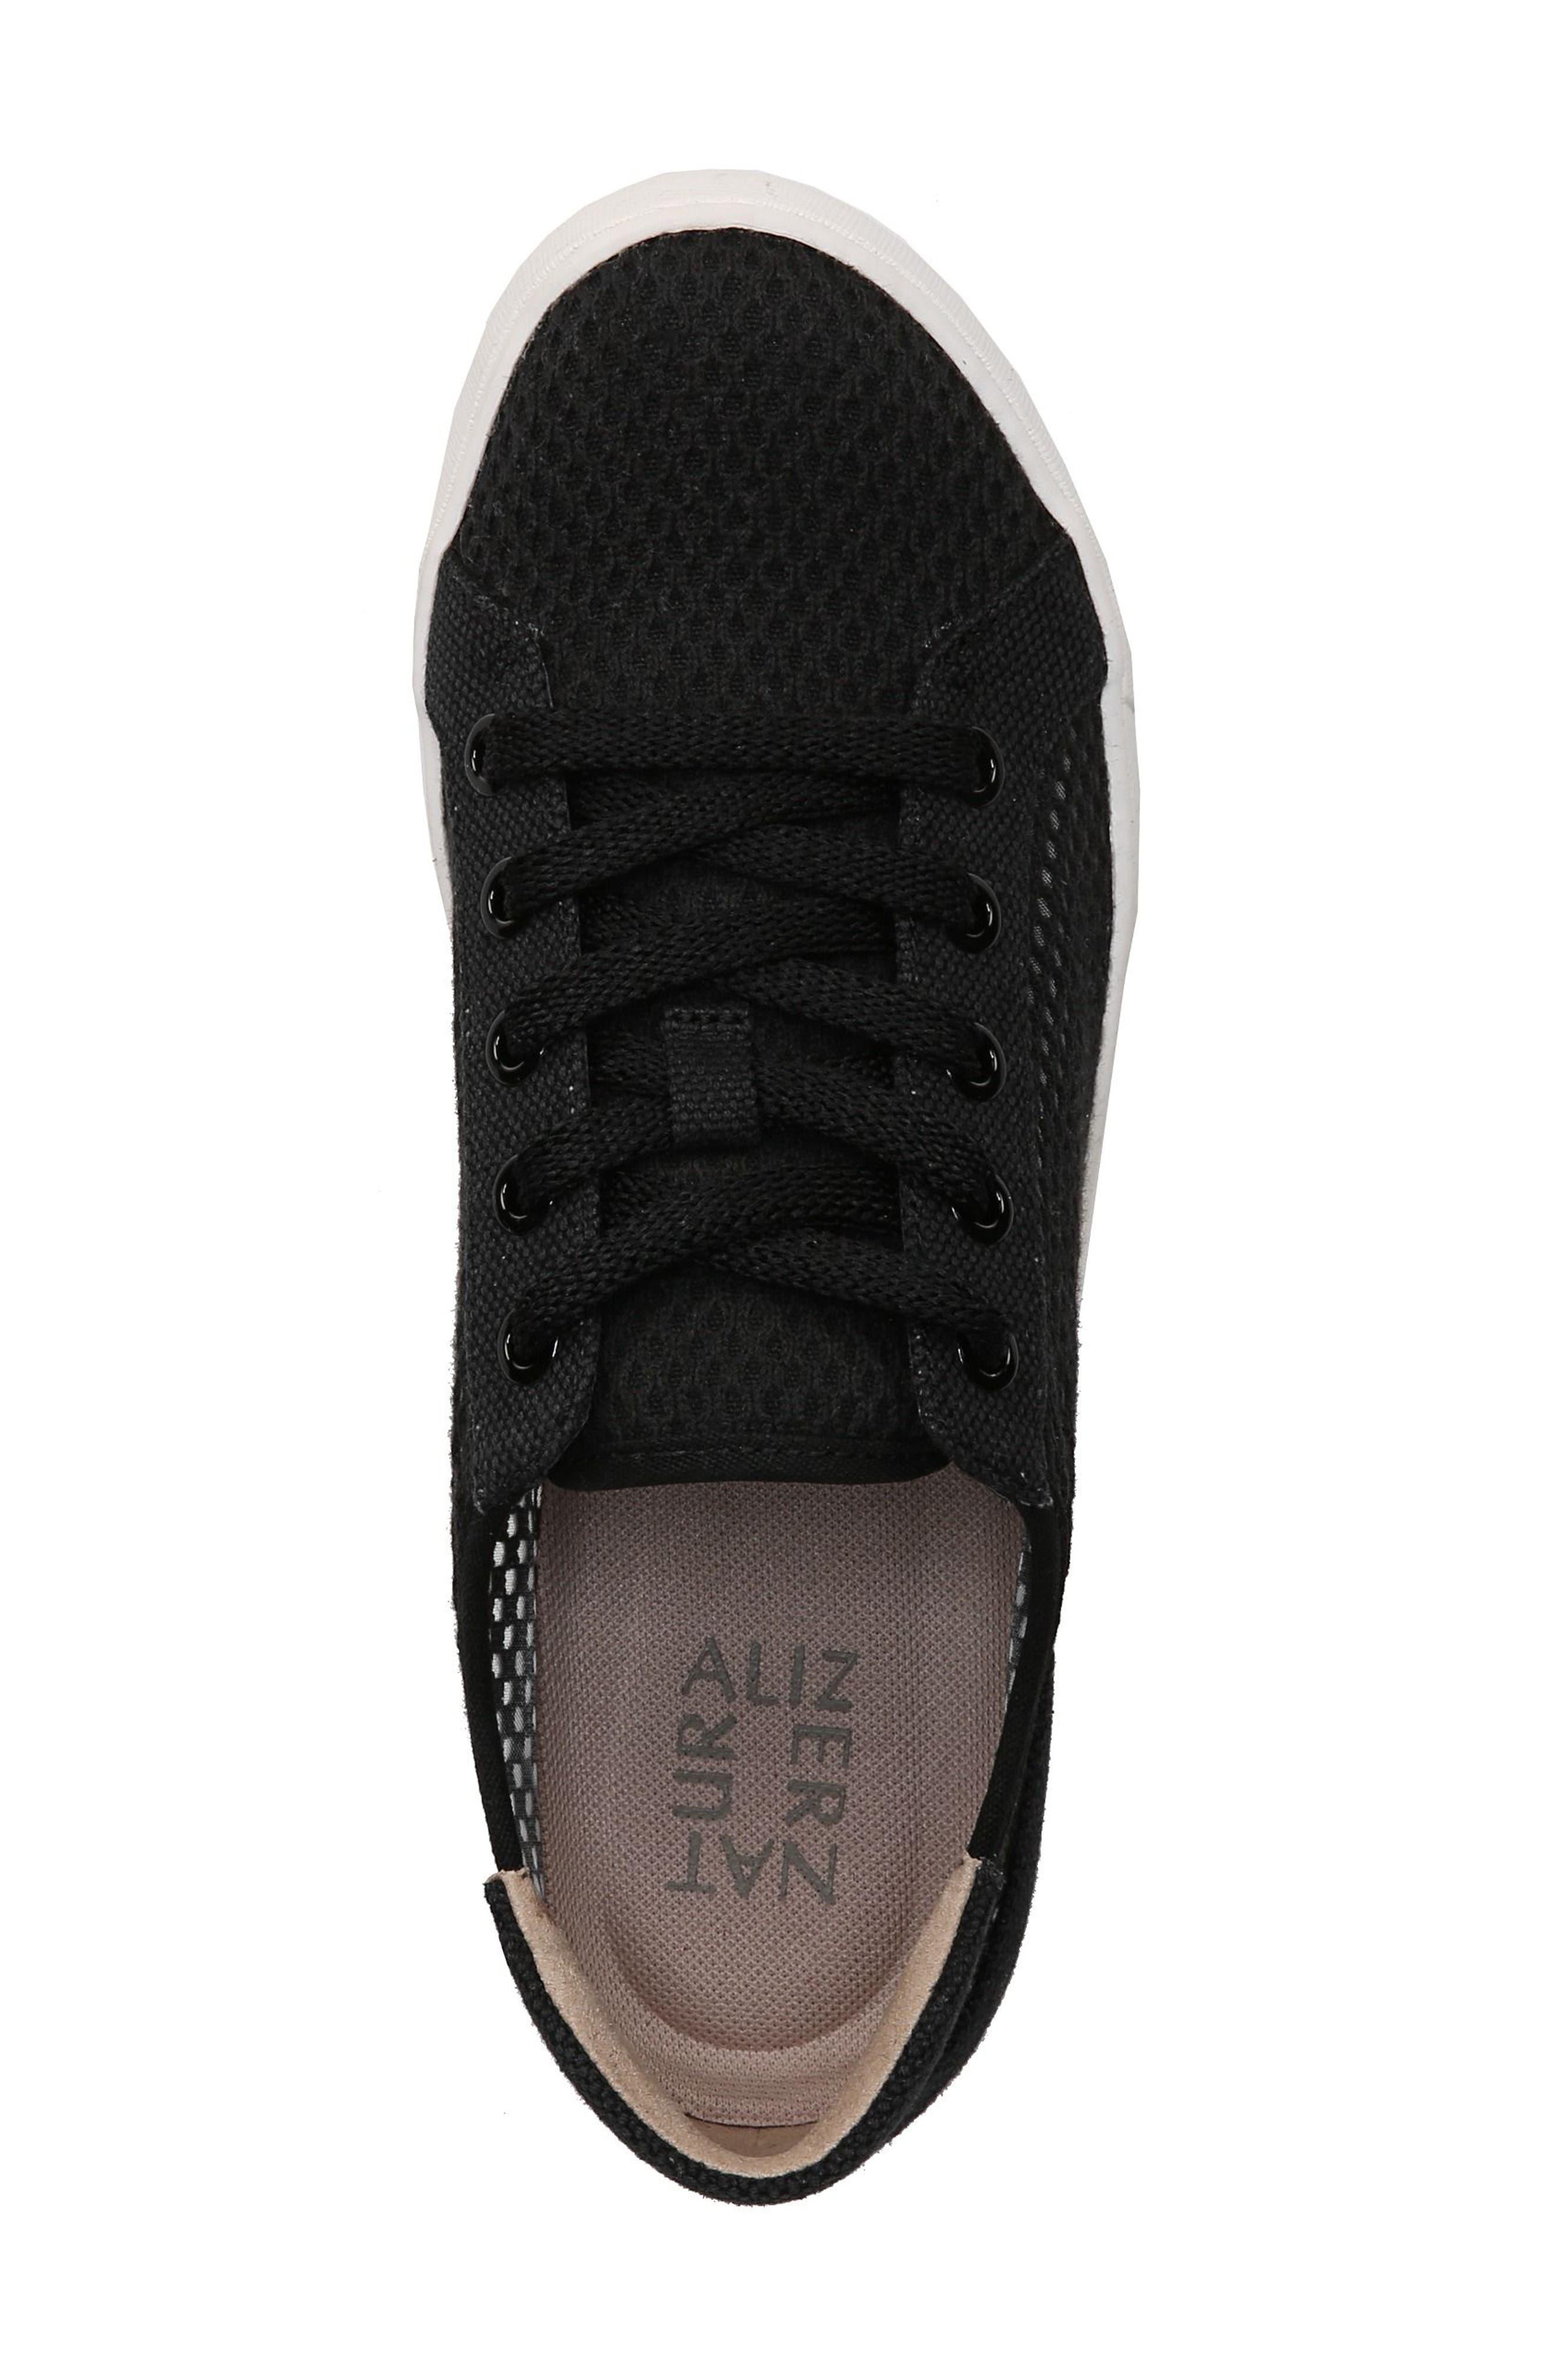 Morrison III Perforated Sneaker,                             Alternate thumbnail 5, color,                             BLACK FABRIC